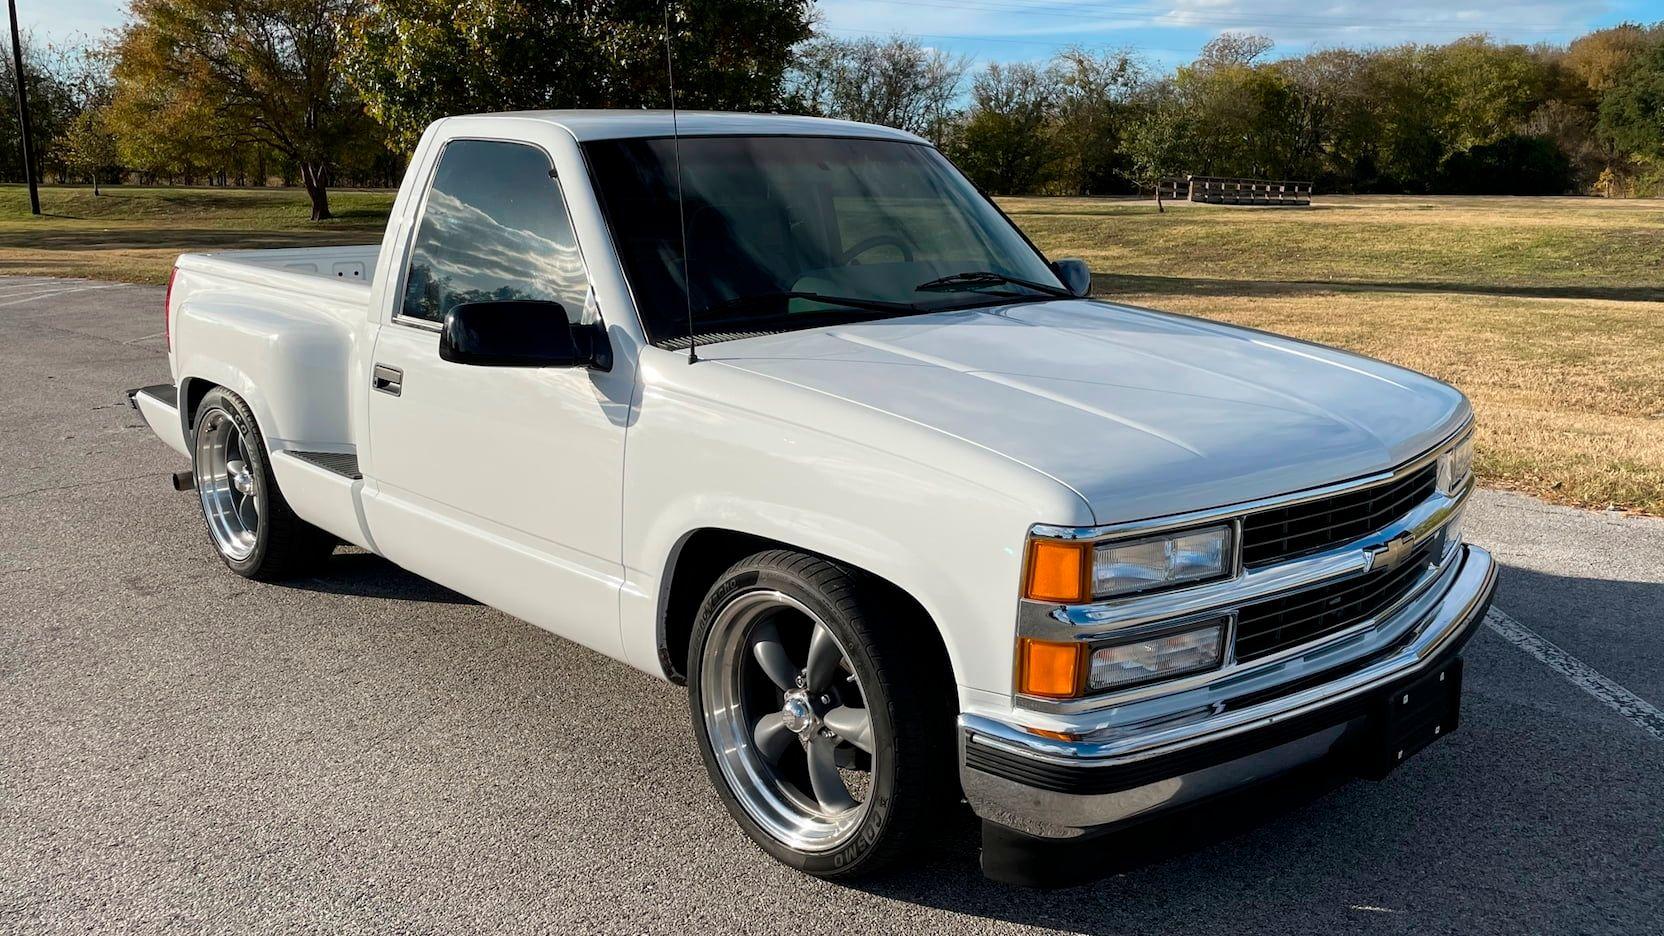 1996 Chevrolet Silverado Pickup Vin 1gcec14m7tz137257 Classic Com